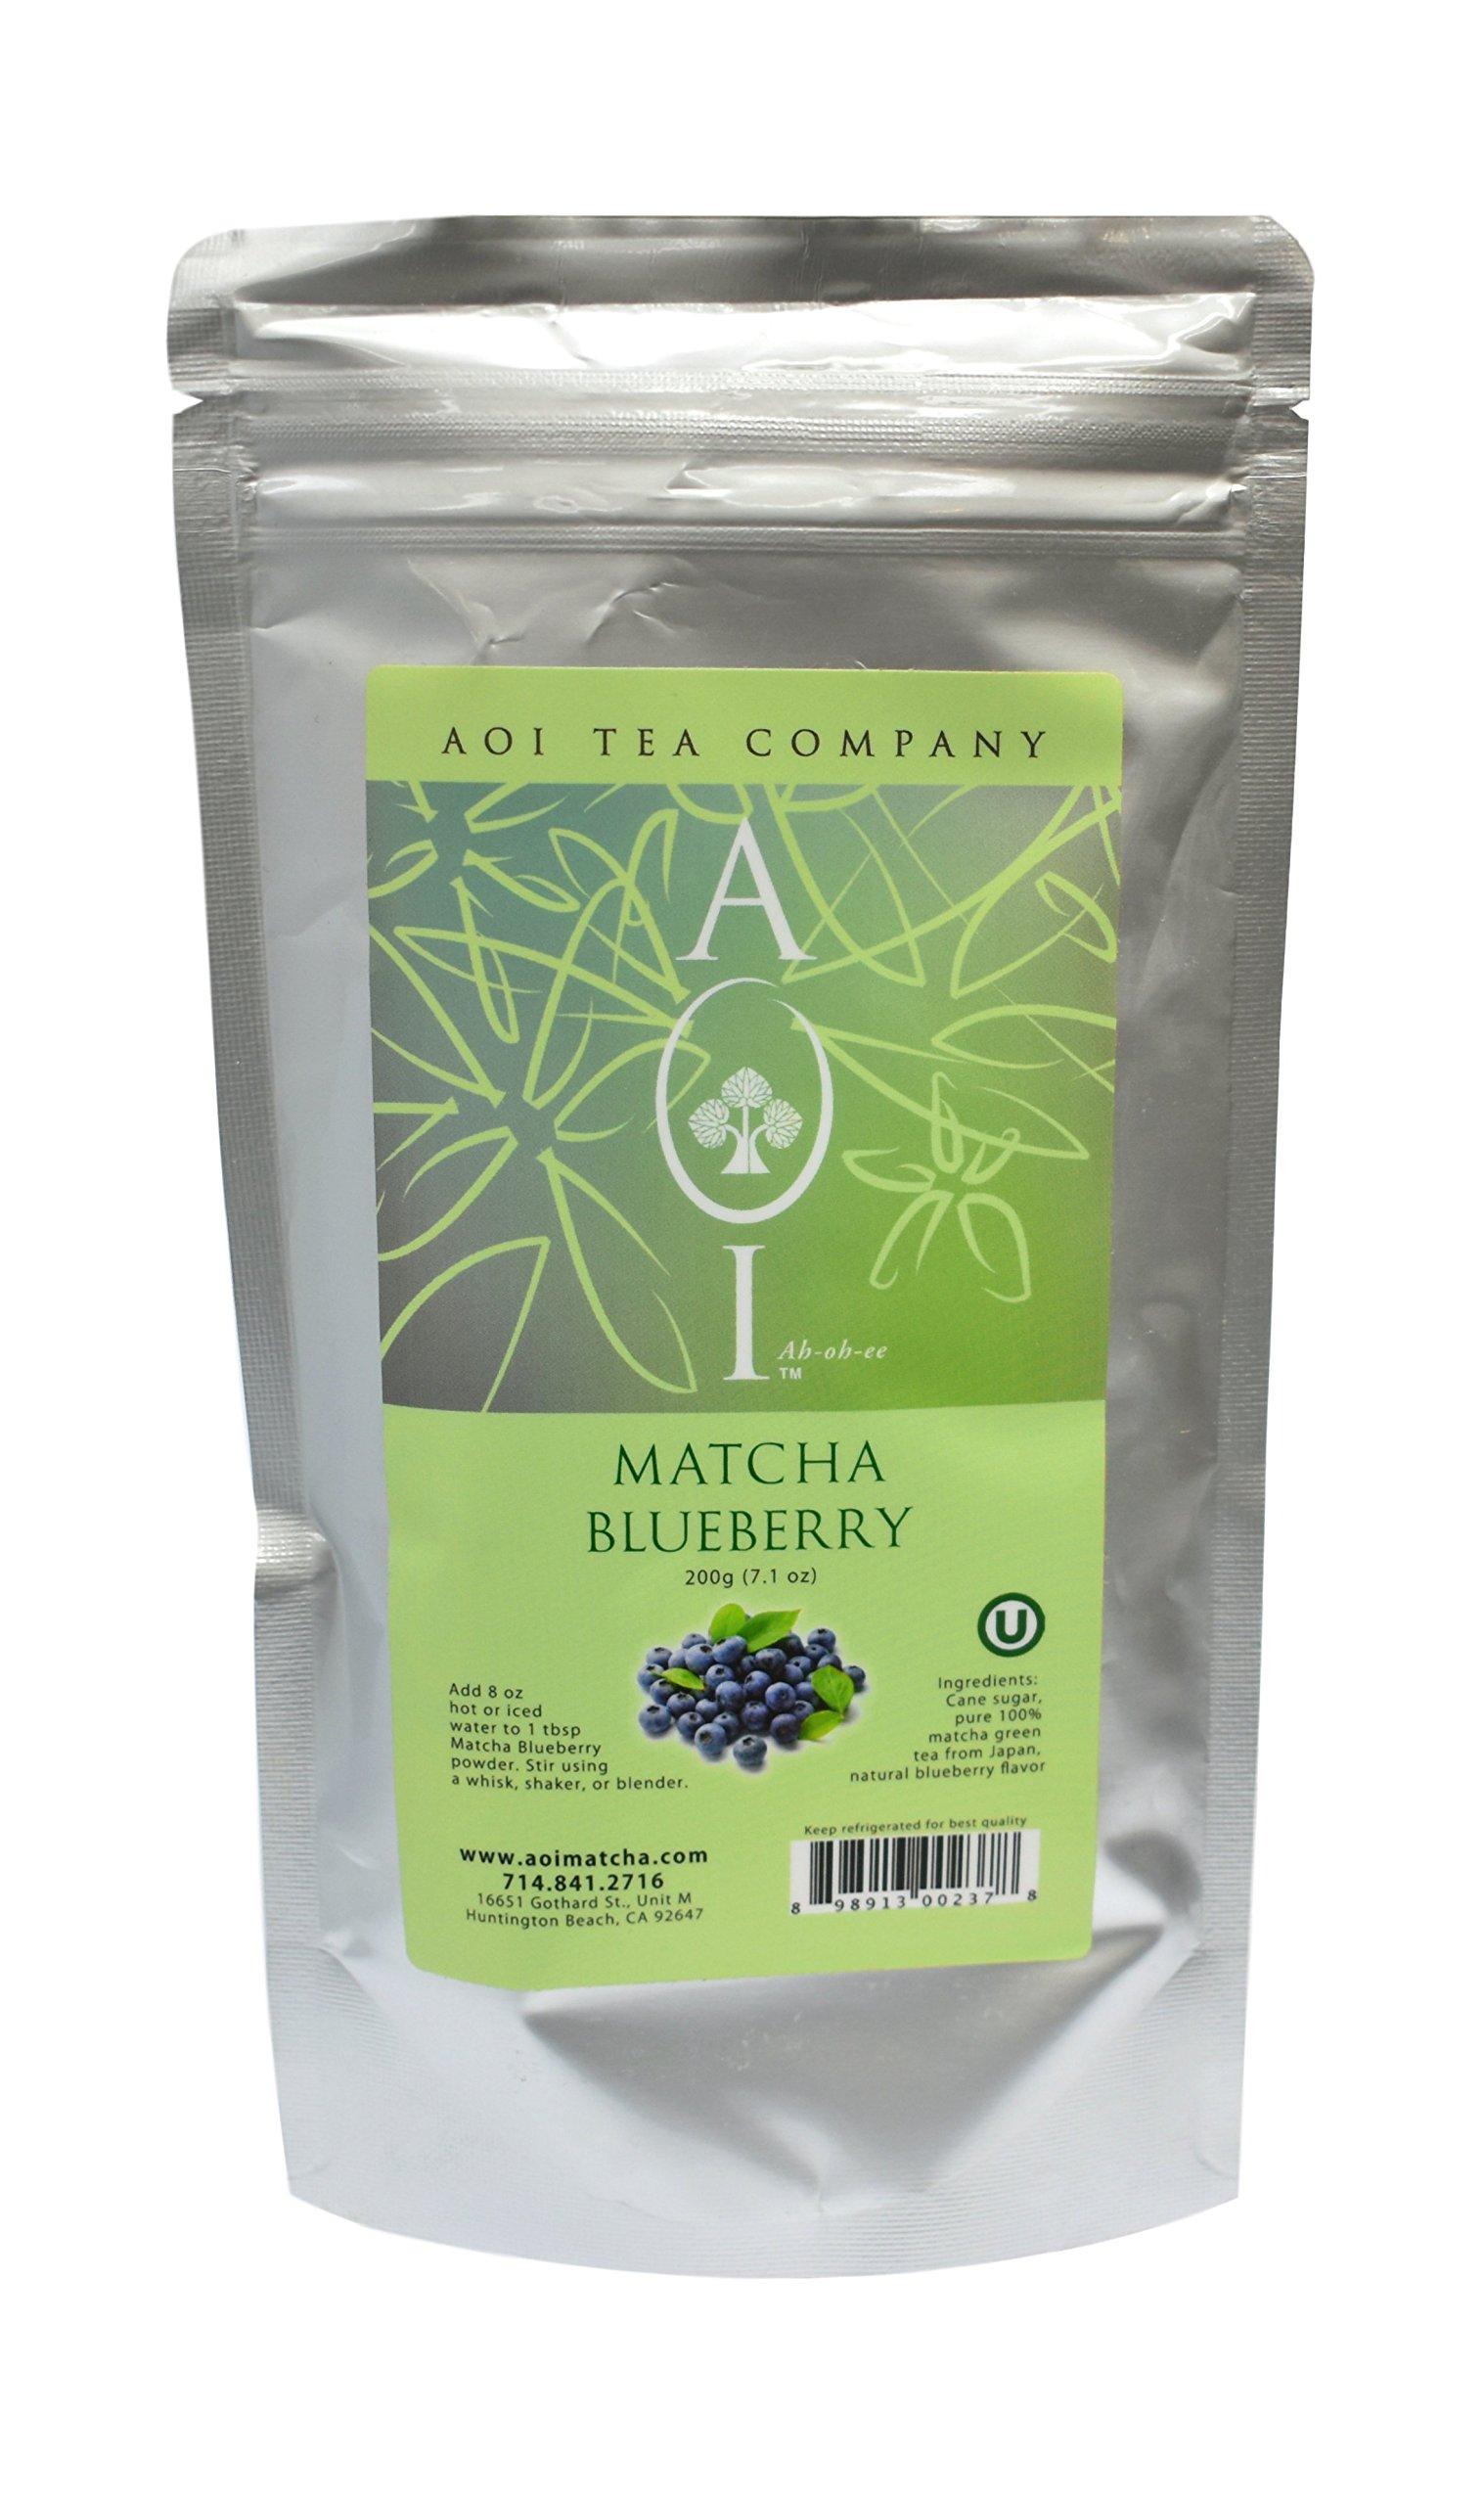 AOI Tea - Matcha Blueberry - Green Tea Powder Blend - 200 grams (7.1 Ounces)